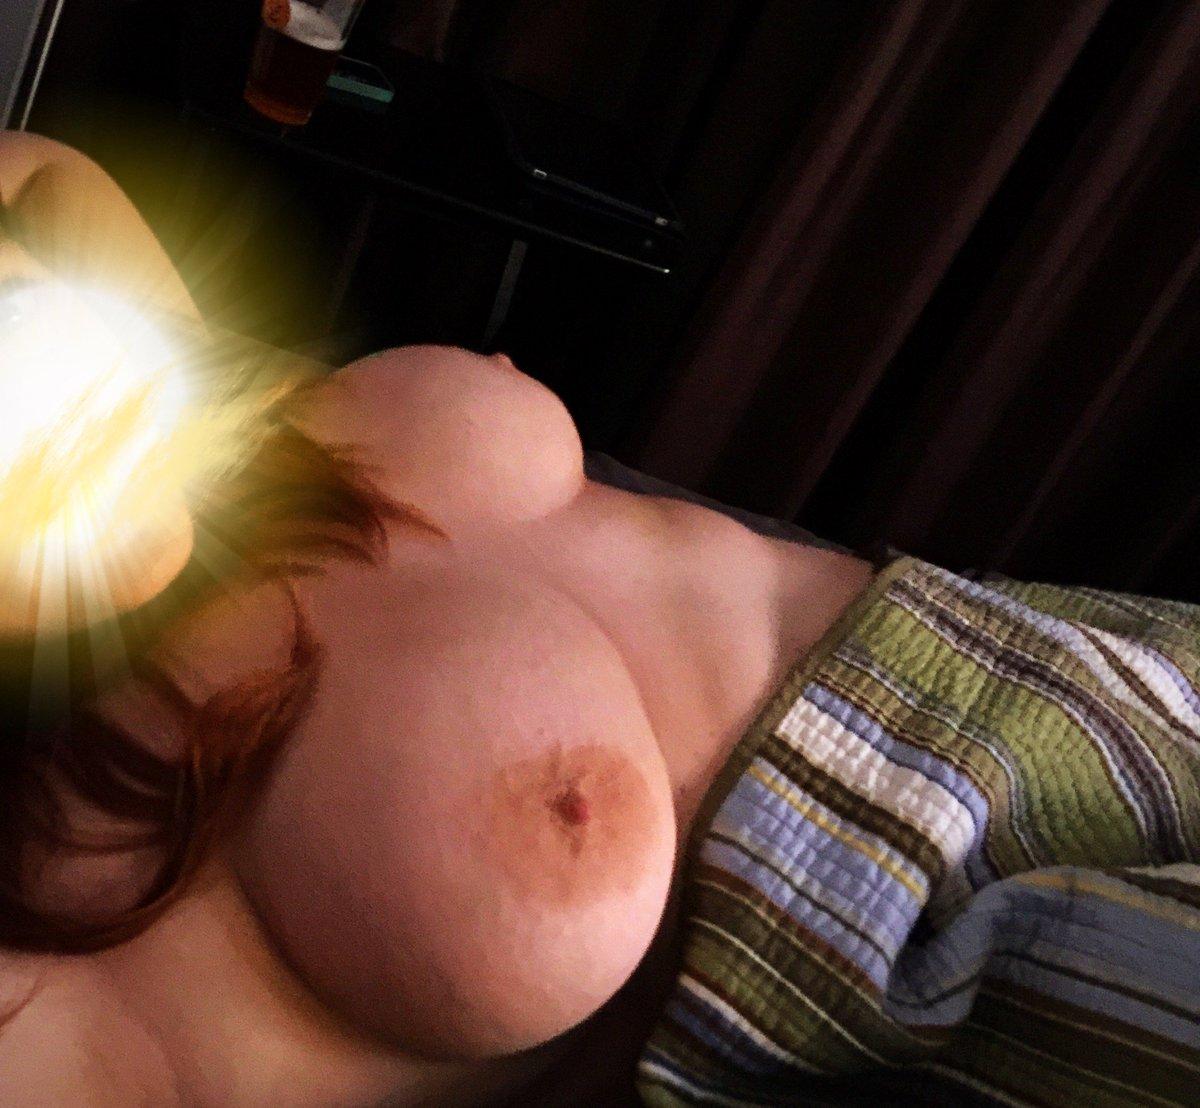 Nude Selfie 9701